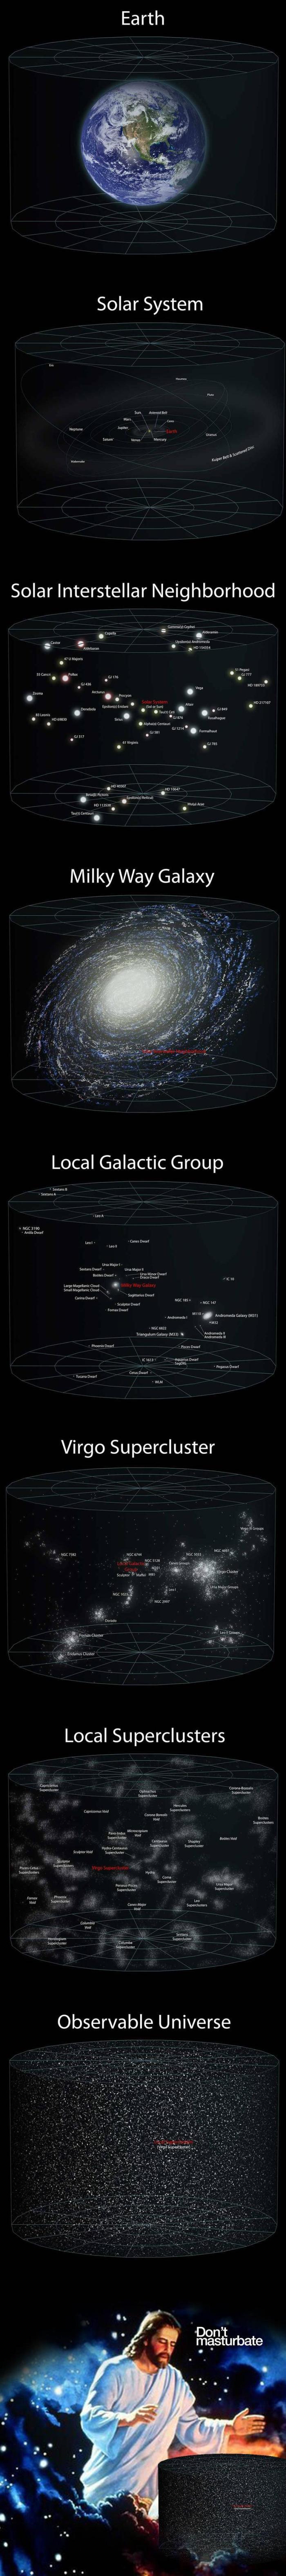 the religious universe.jpg